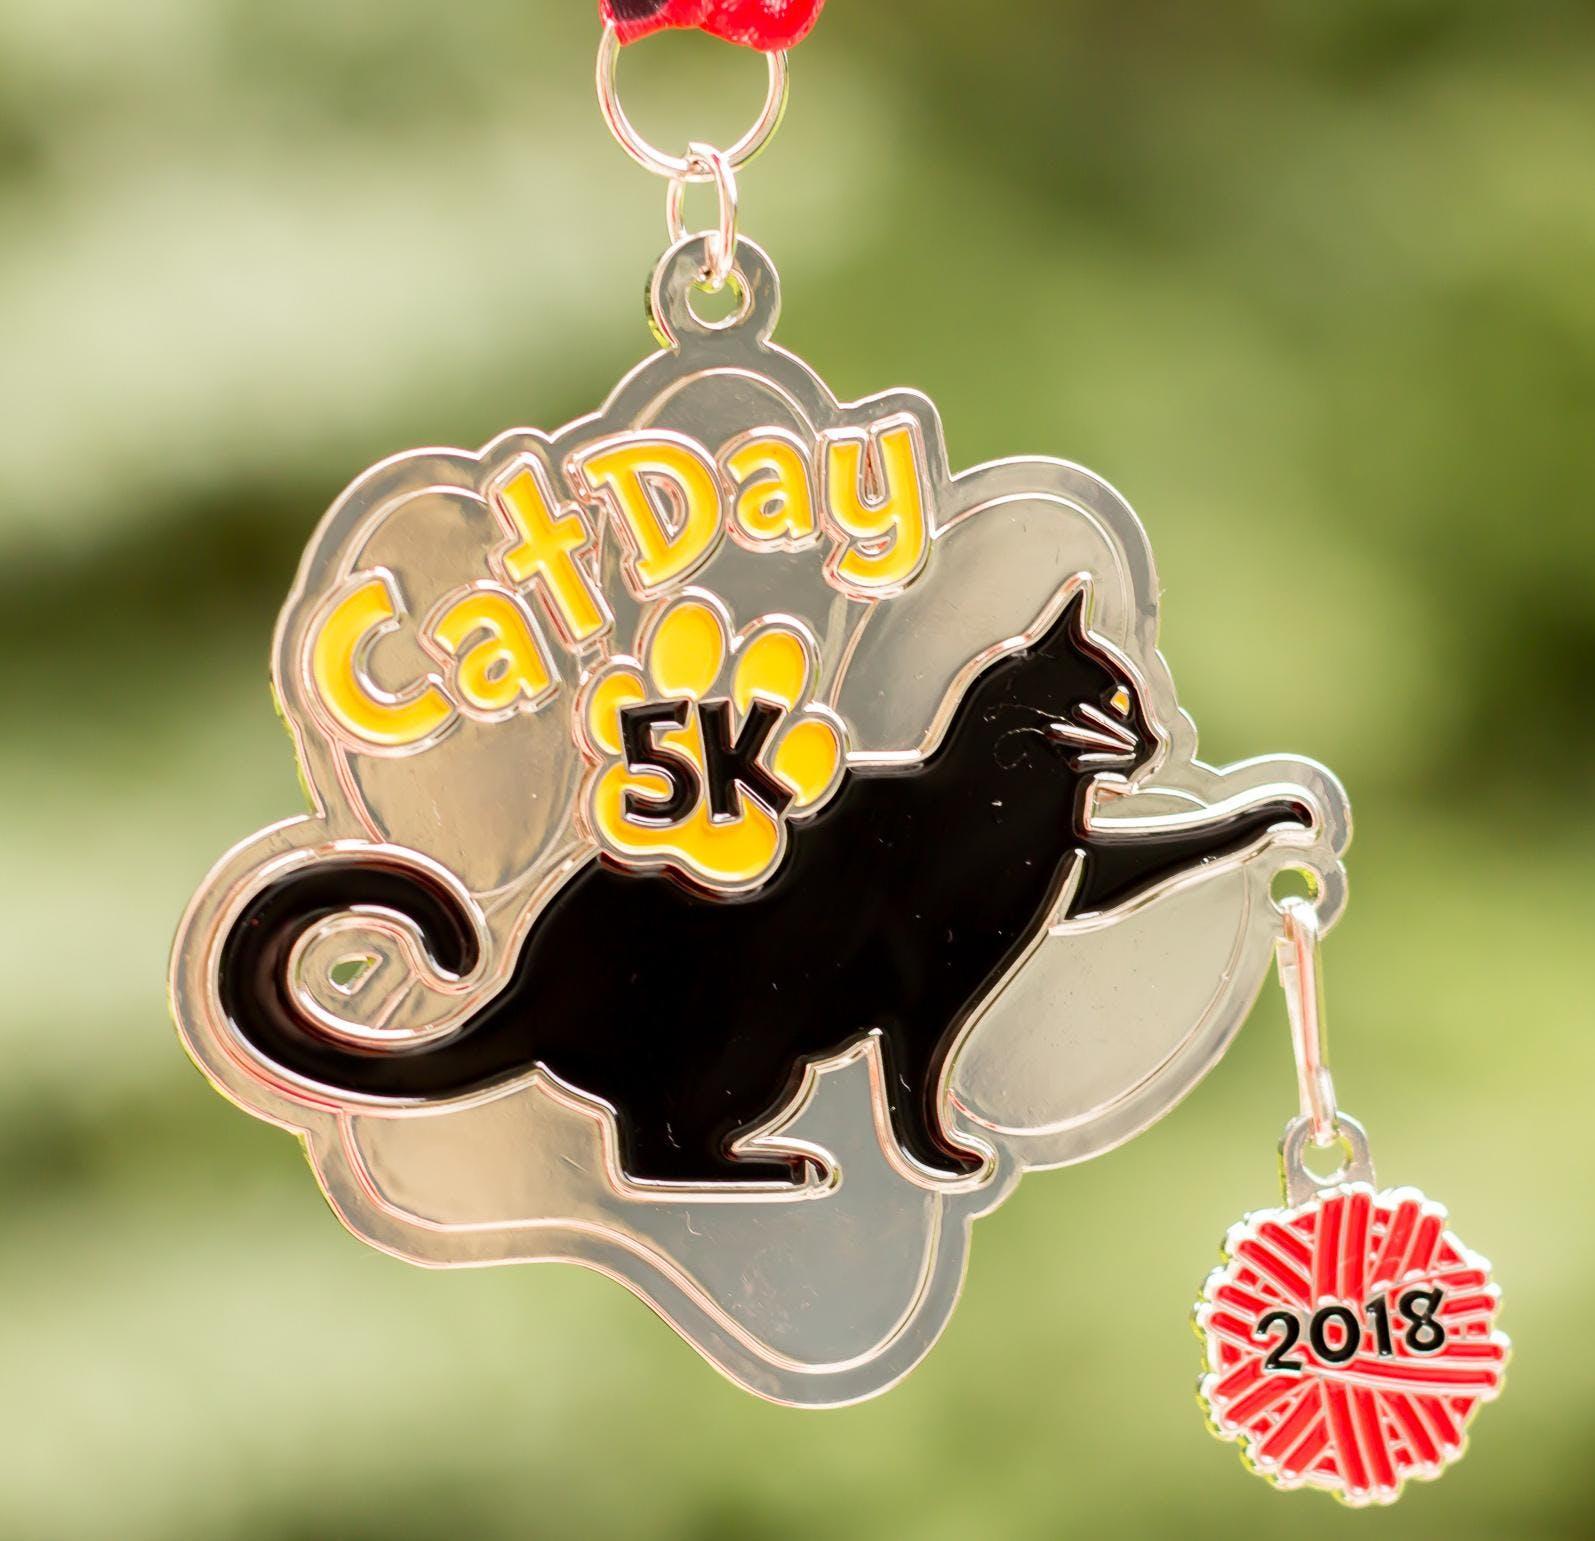 Now Only $10 Cat Day 5K & 10K -Houston